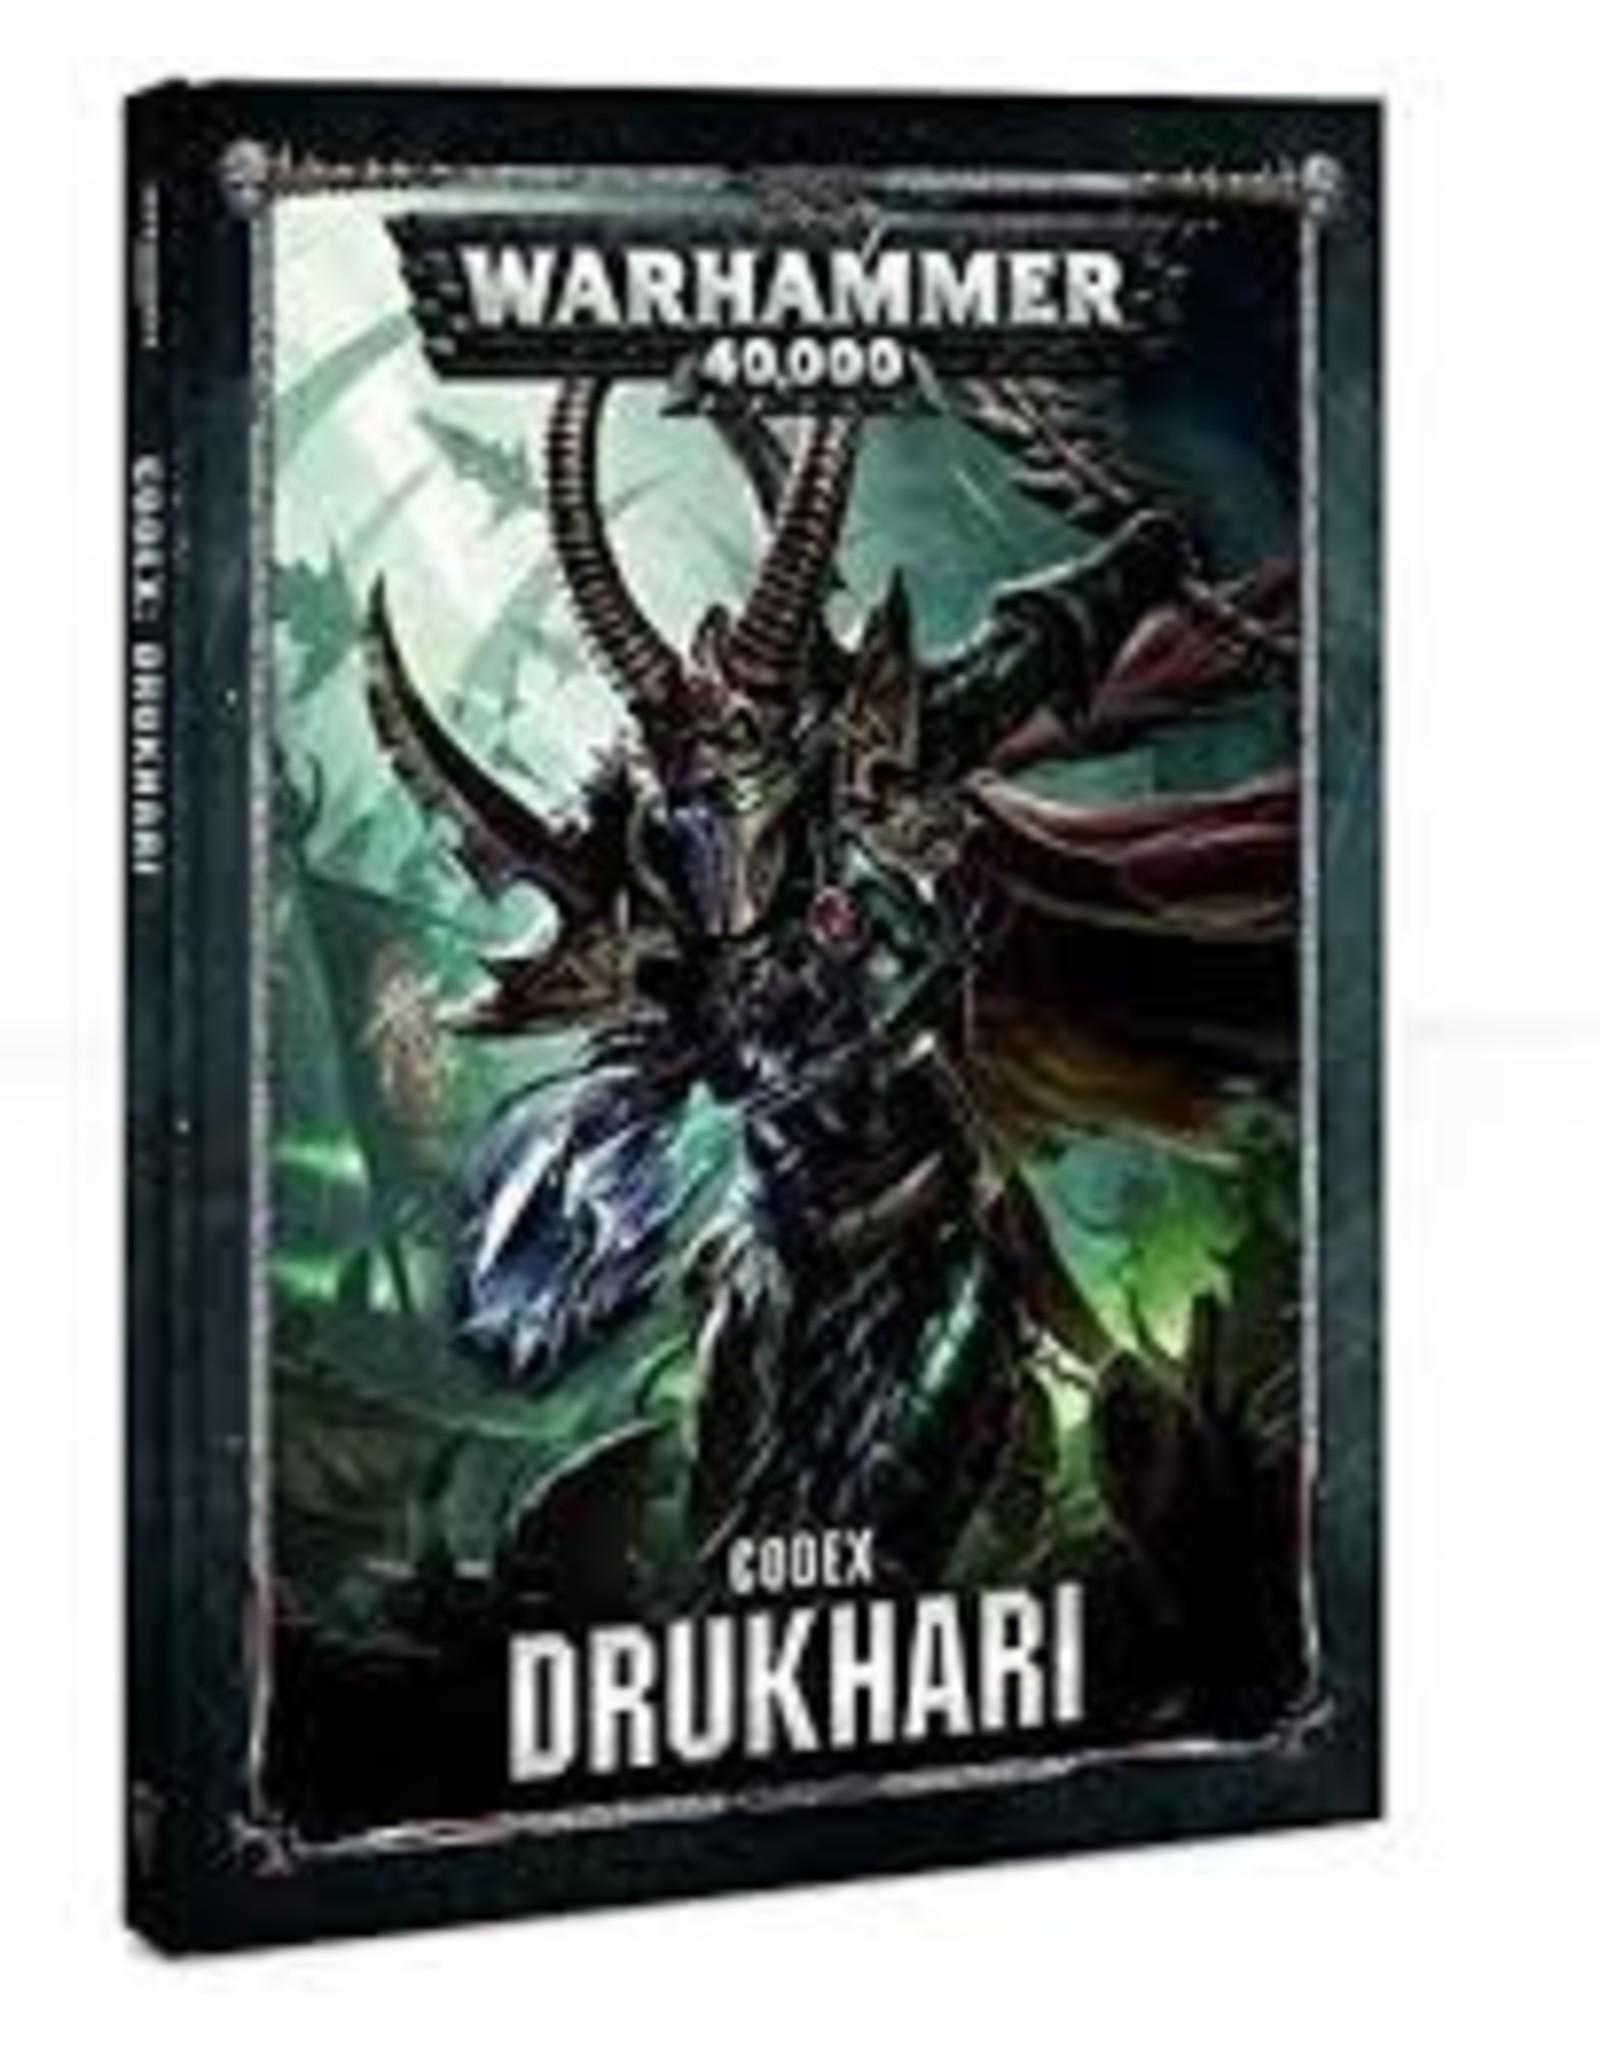 Warhammer 40K Codex: Drukhari